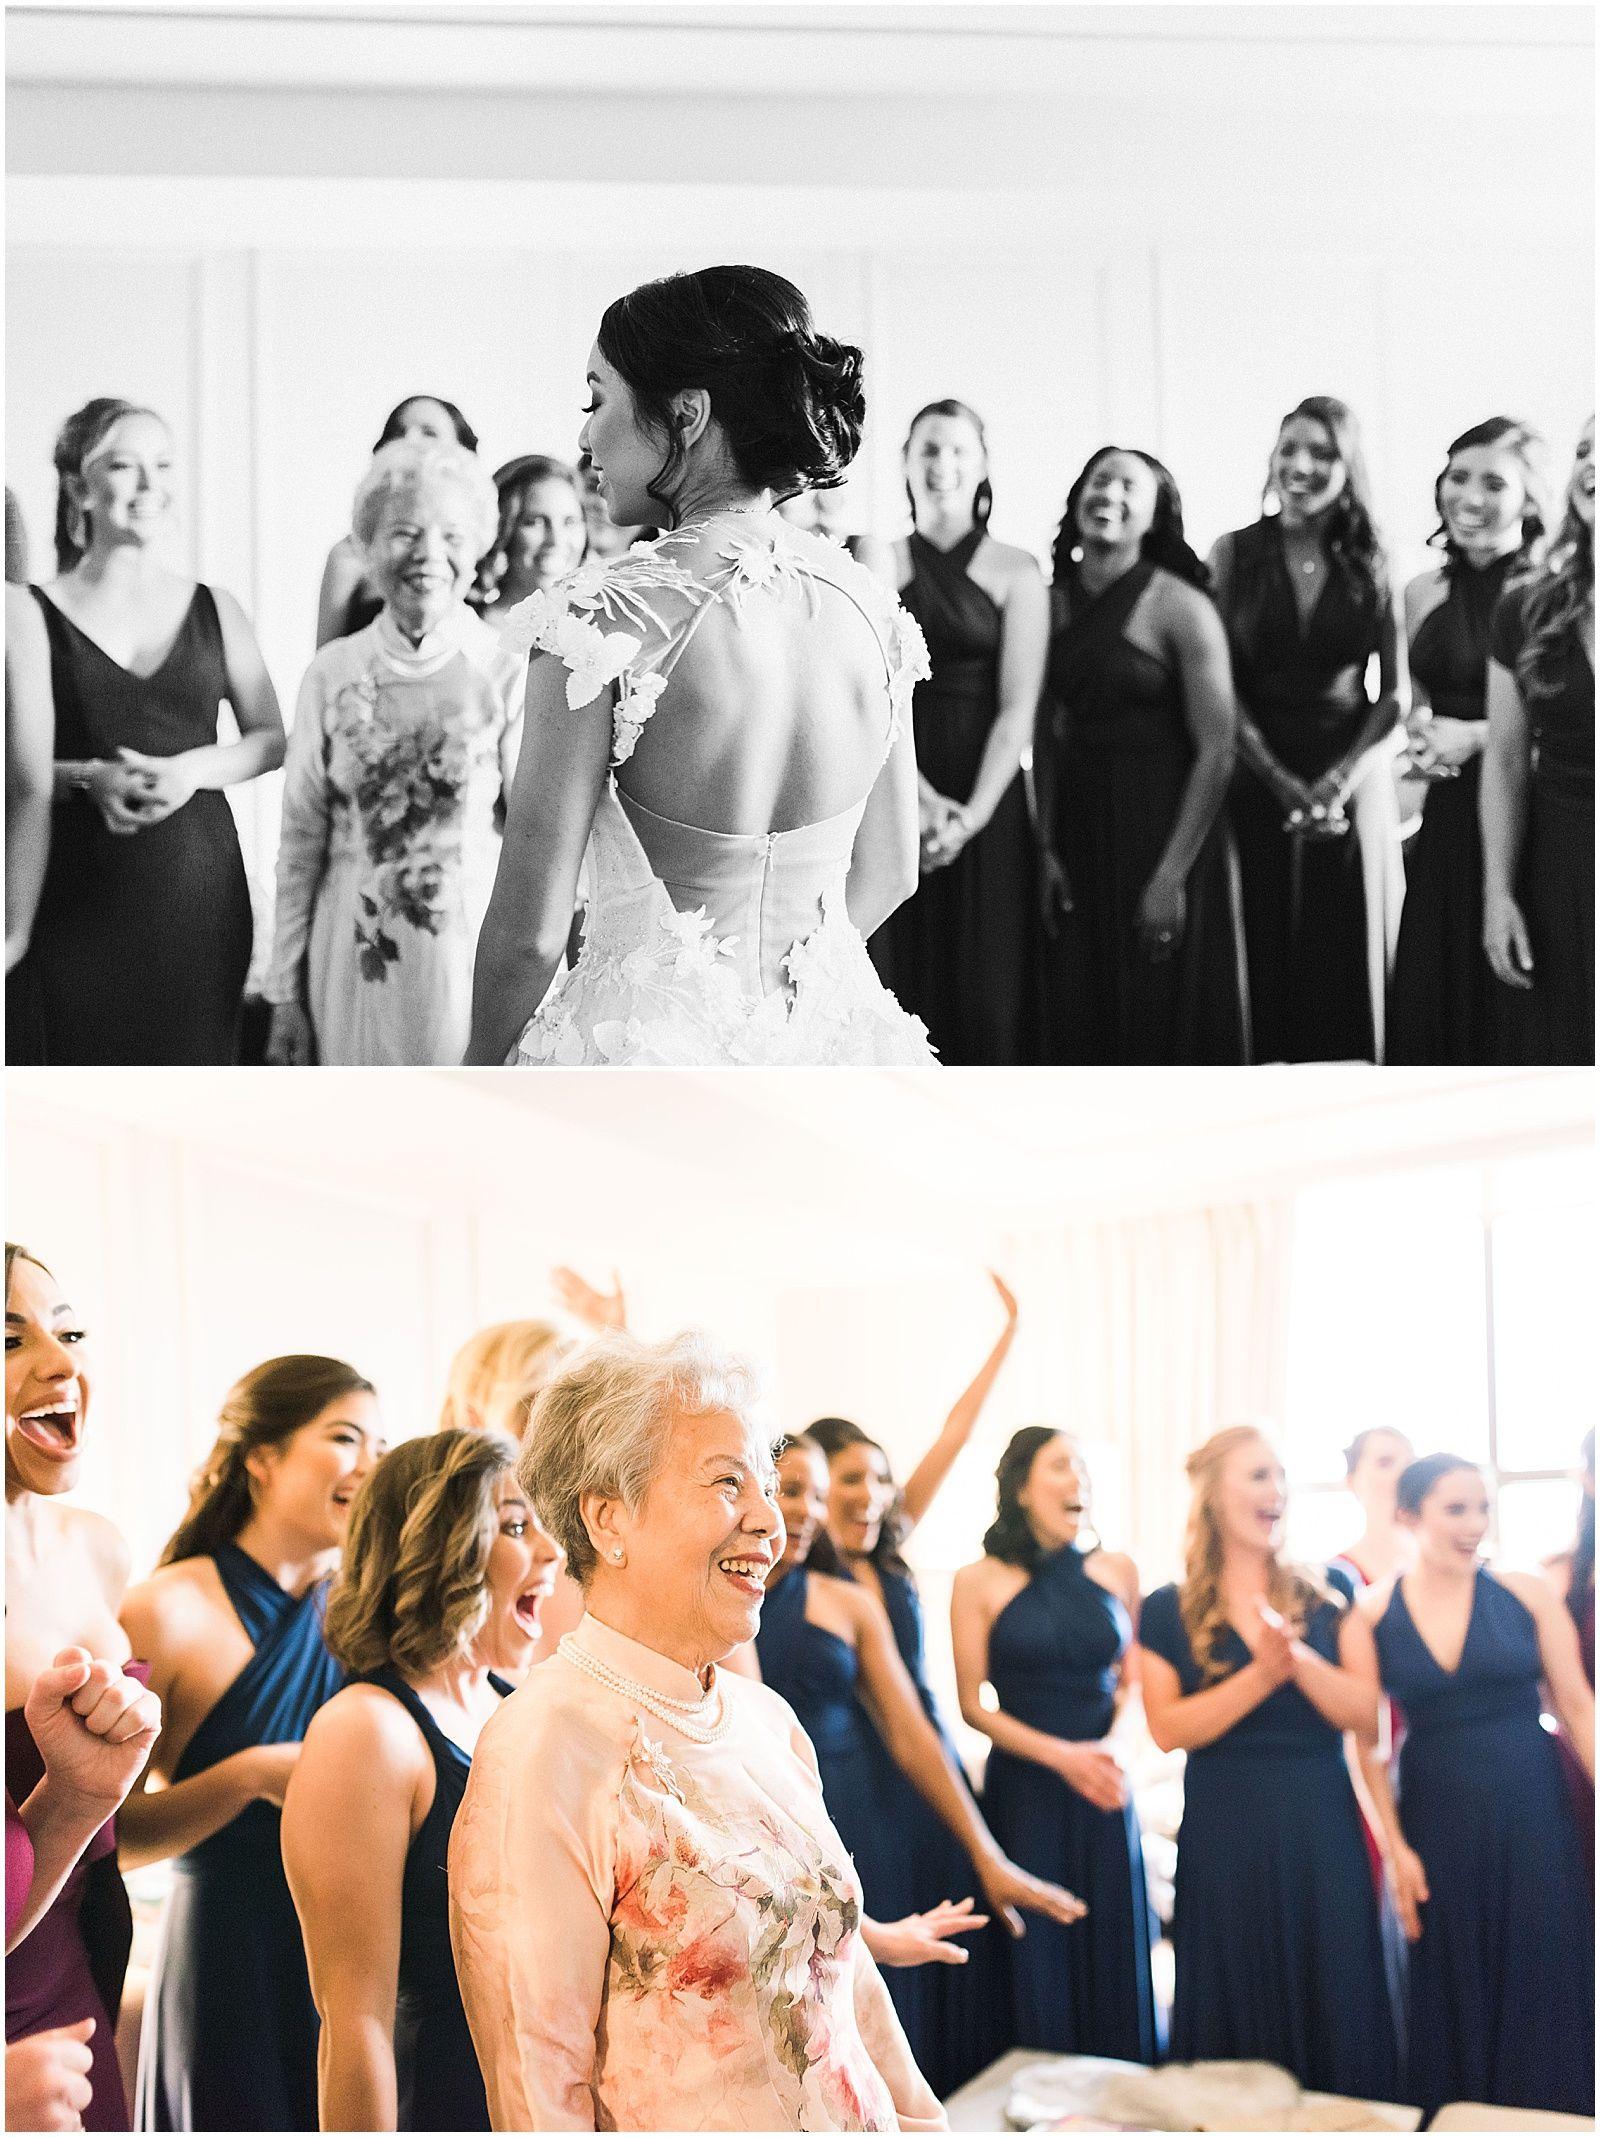 Dallas Austin Wedding photographer Dallas wedding